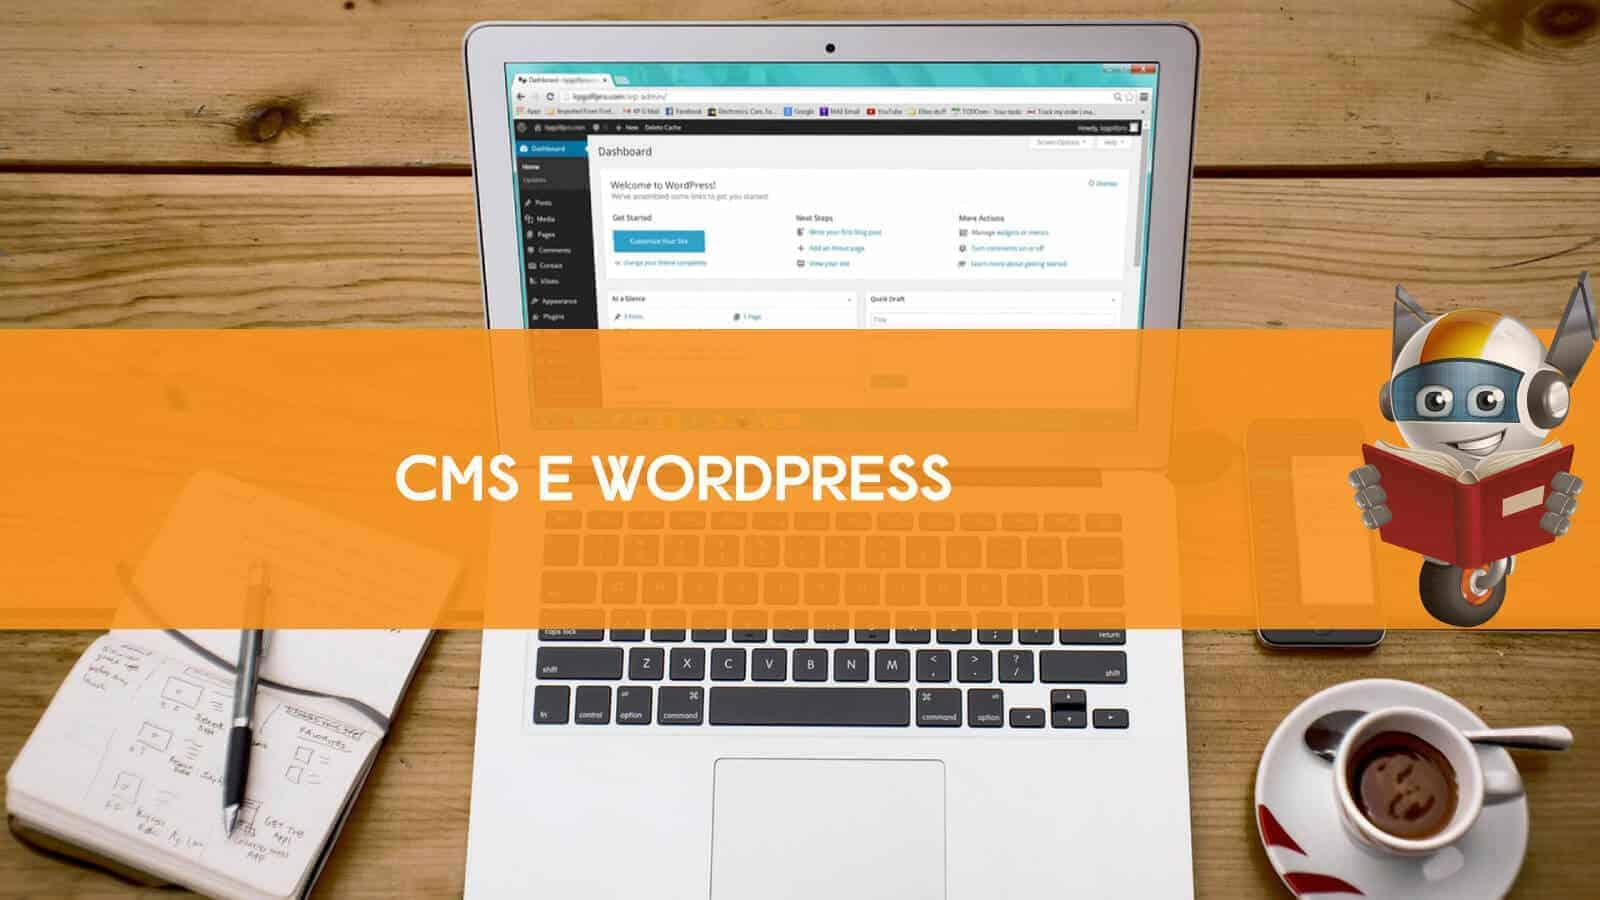 Copertina QD Post 2019-09-13 - CMS e WordPress